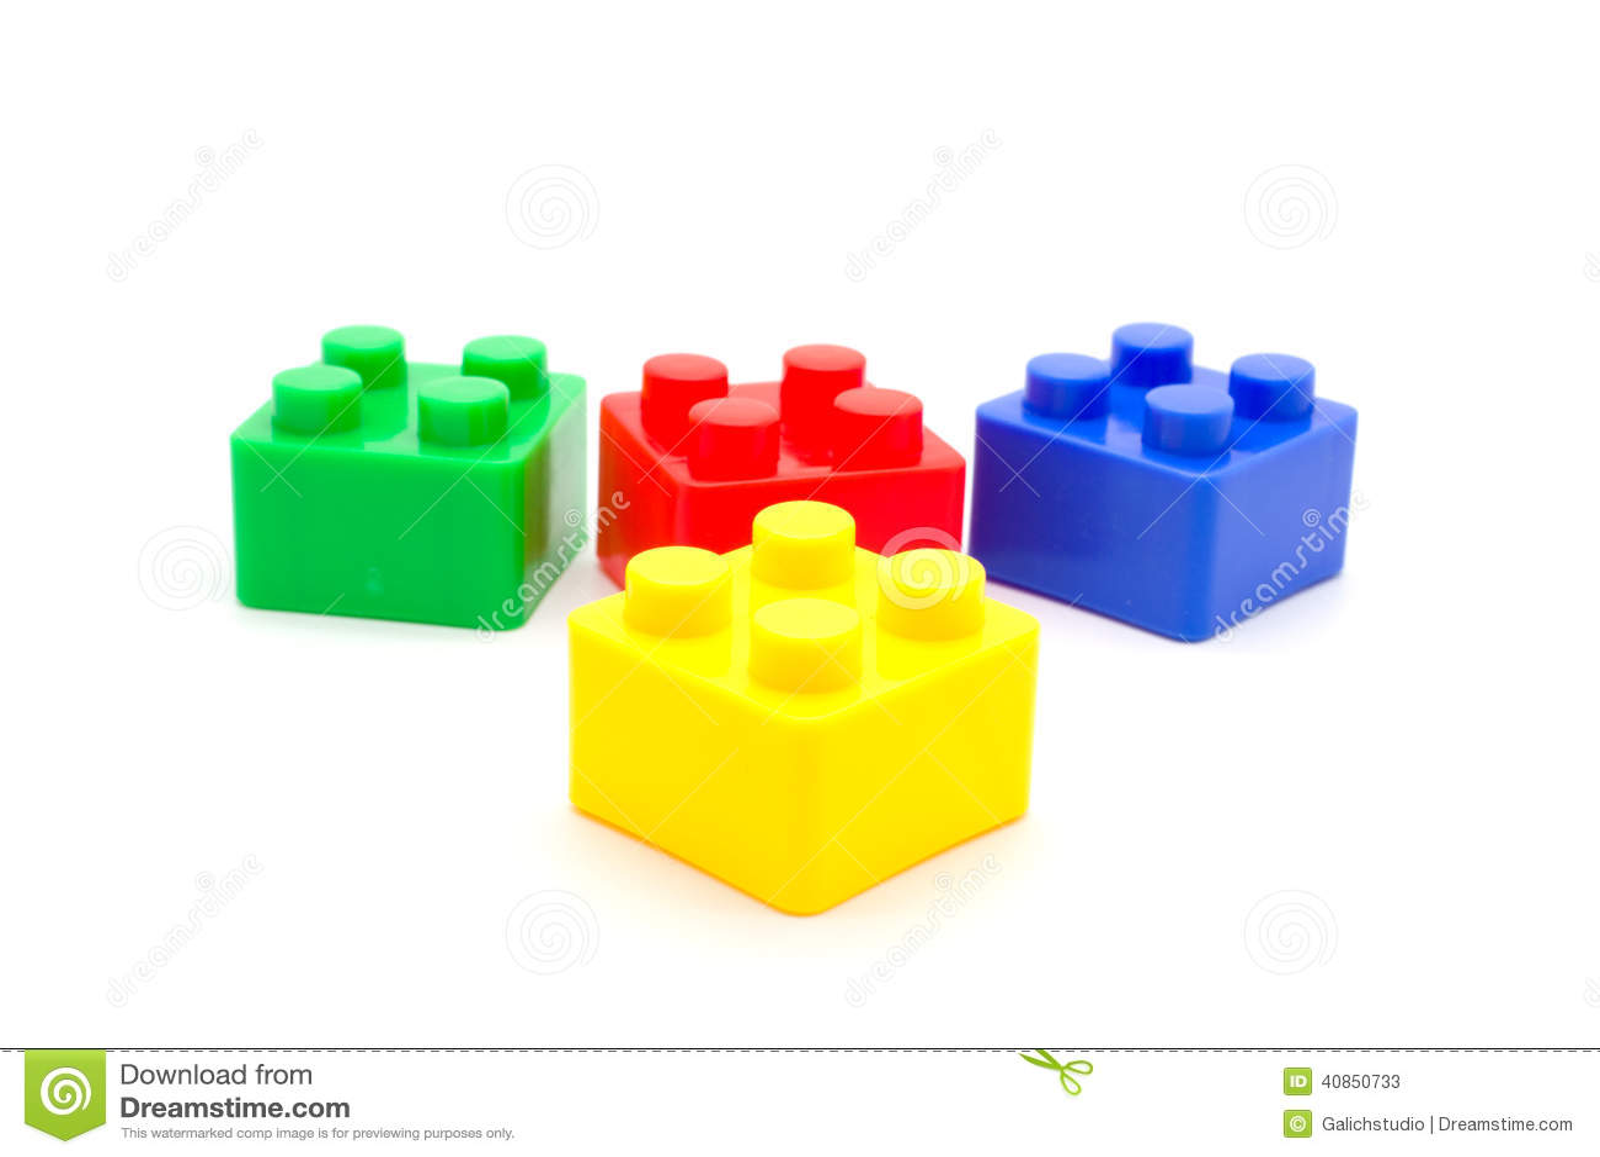 Lego Plastic Building Blocks On White Stock Photo Image